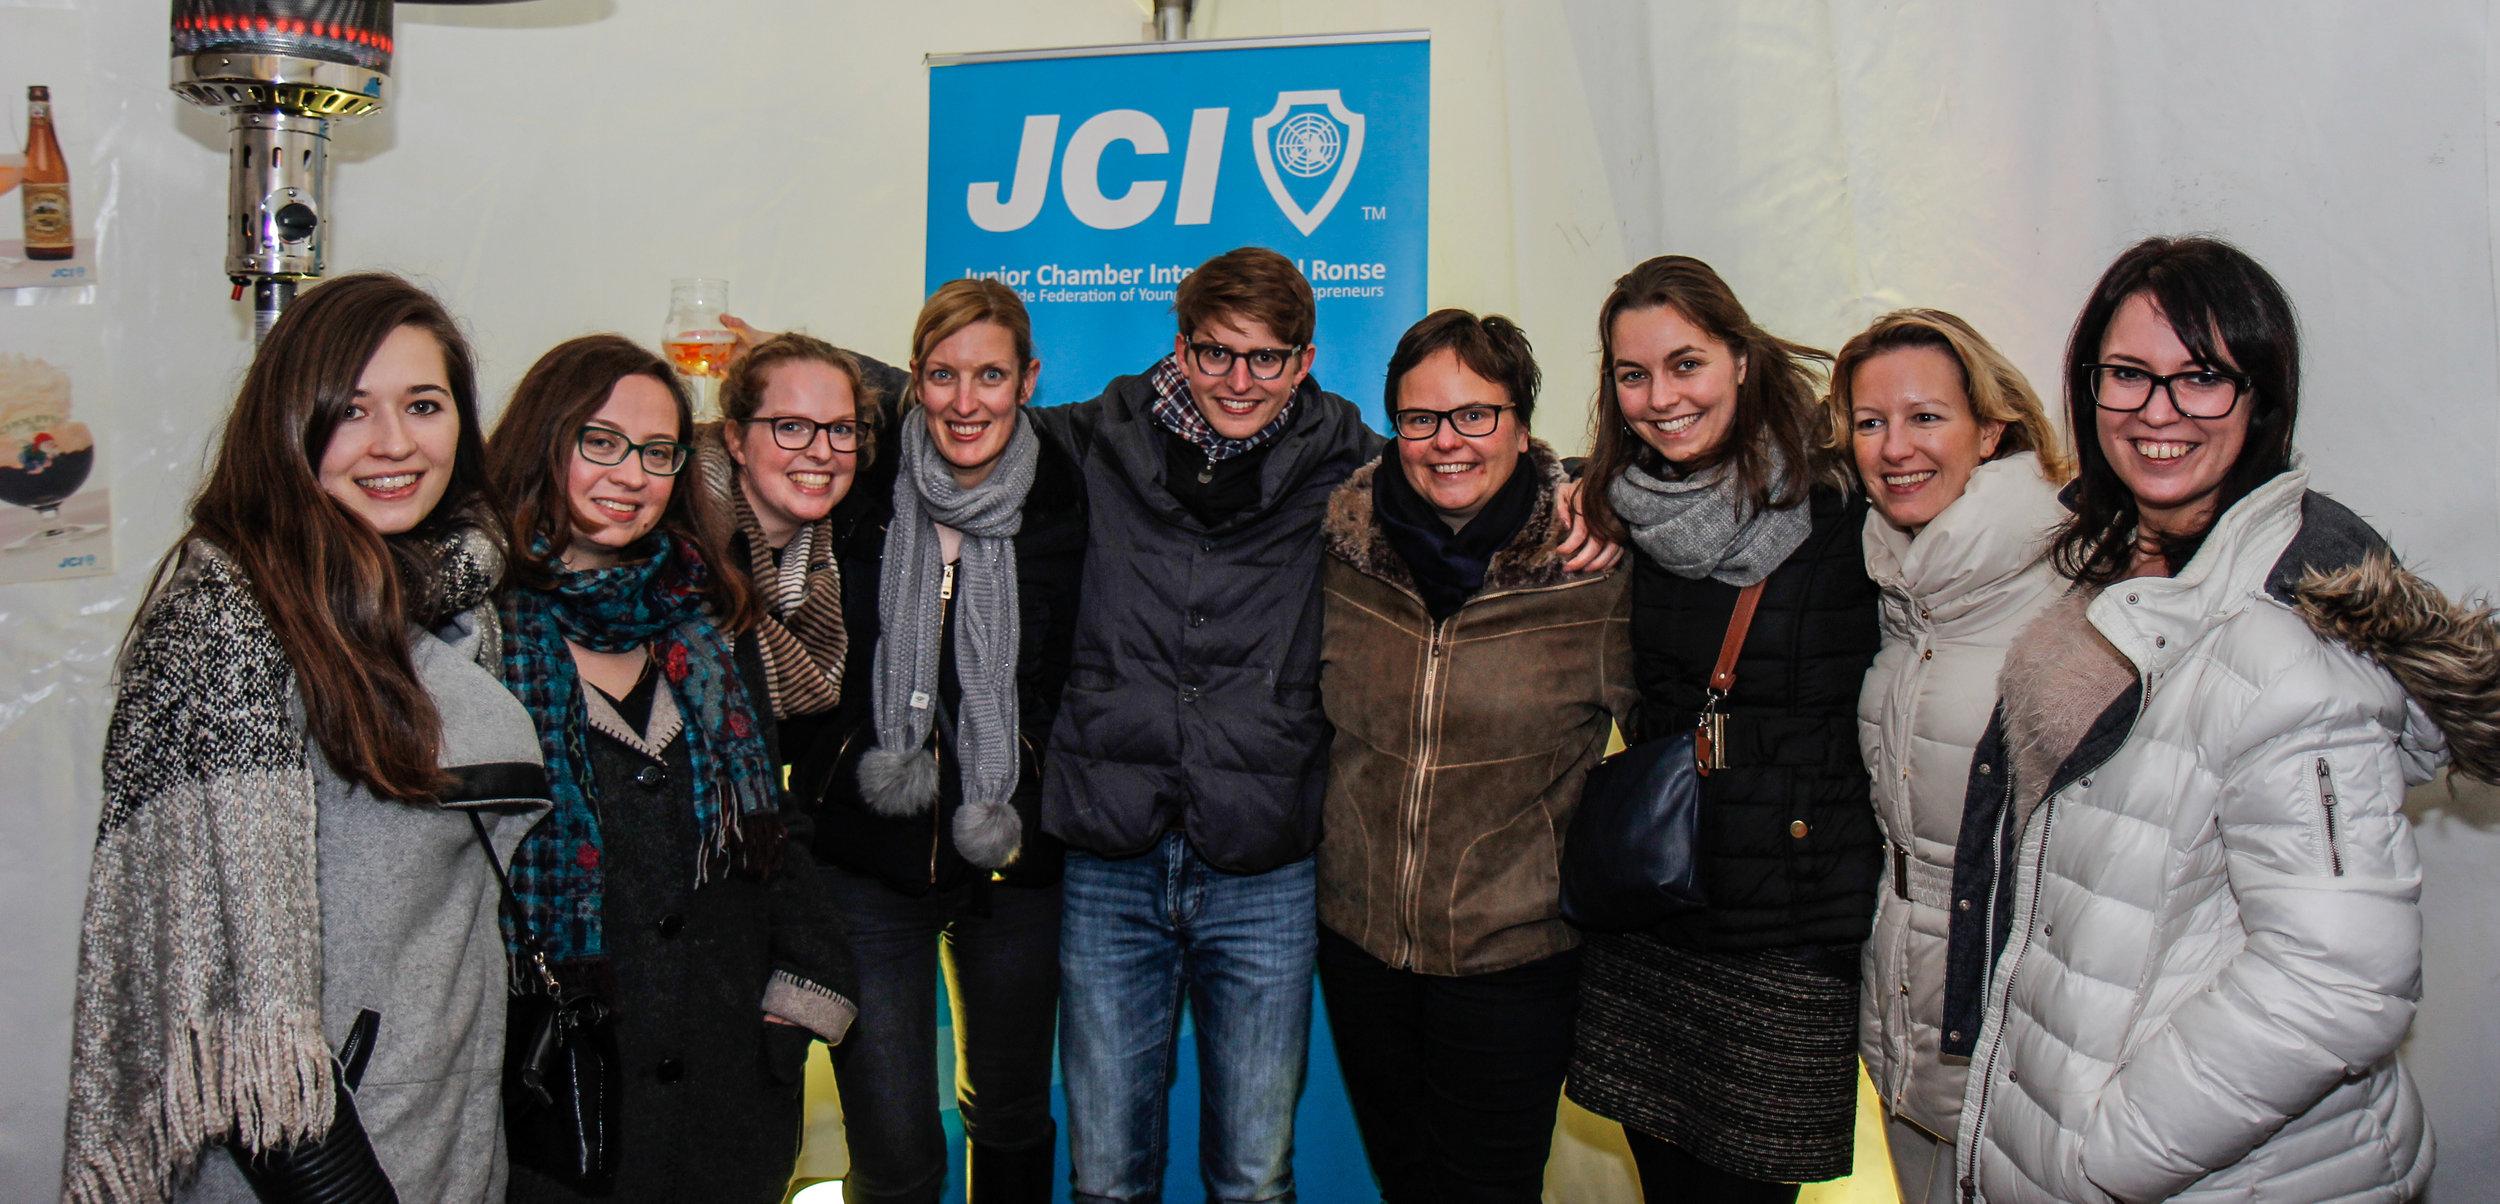 JCI_site_kerstmarkt_Ronse_2016 (77 of 83).jpg